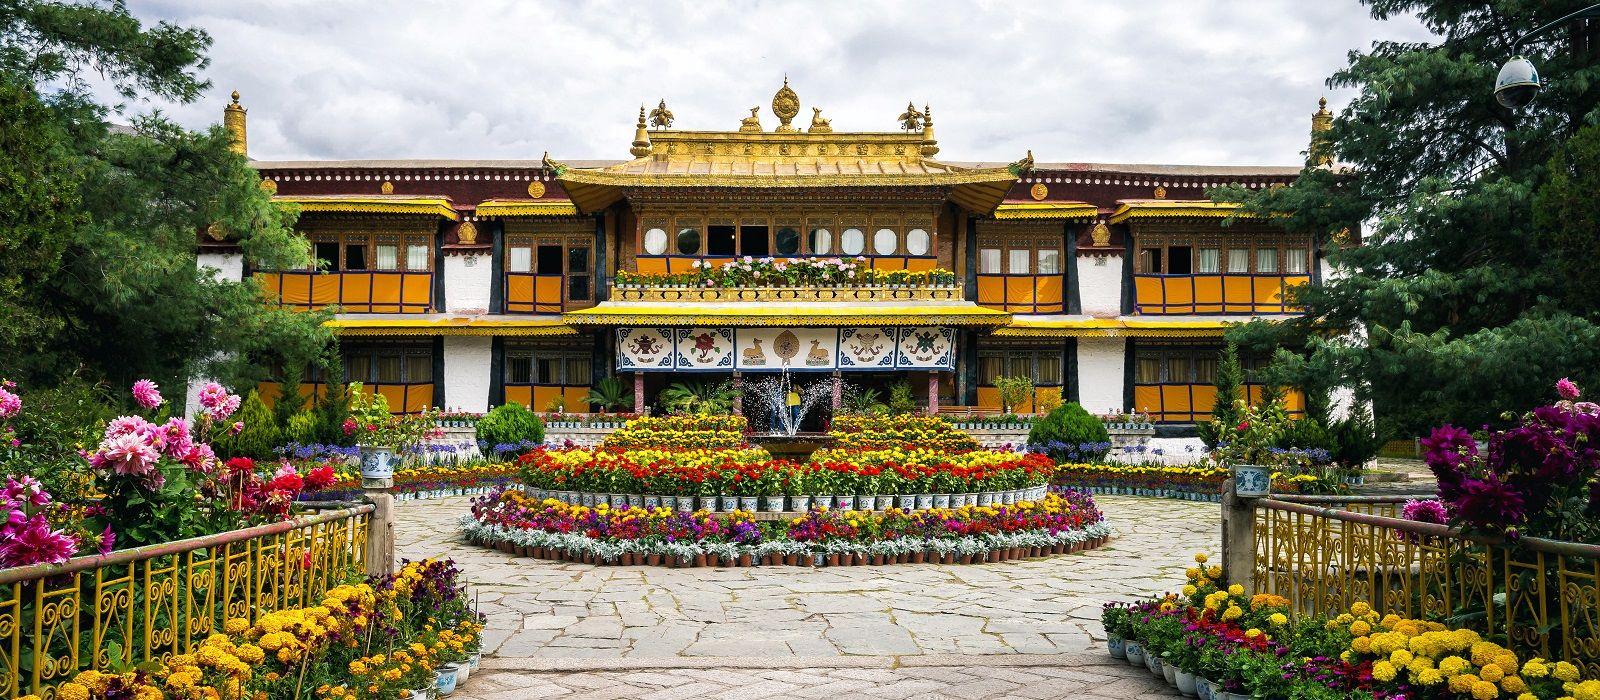 Destination Lhasa Tibet